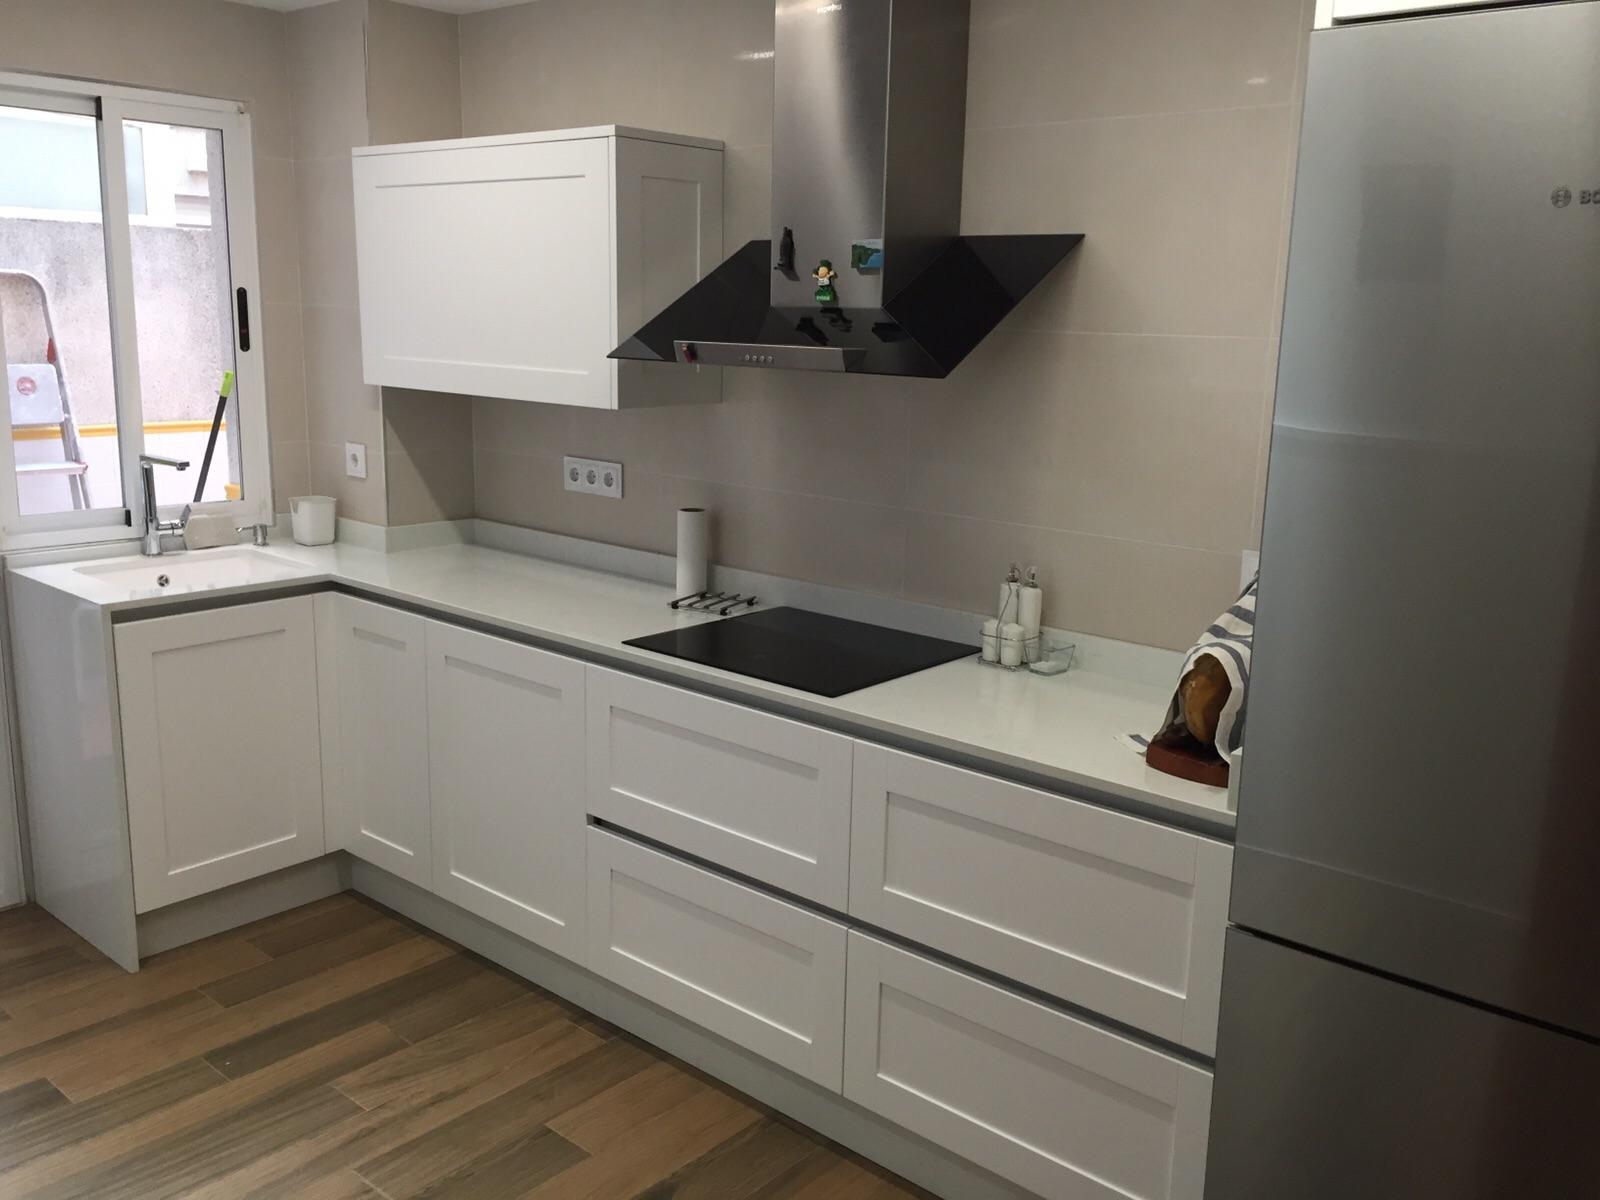 Cocina blanca enmarcada lacado satinado - ActualCocinas - Carpintería